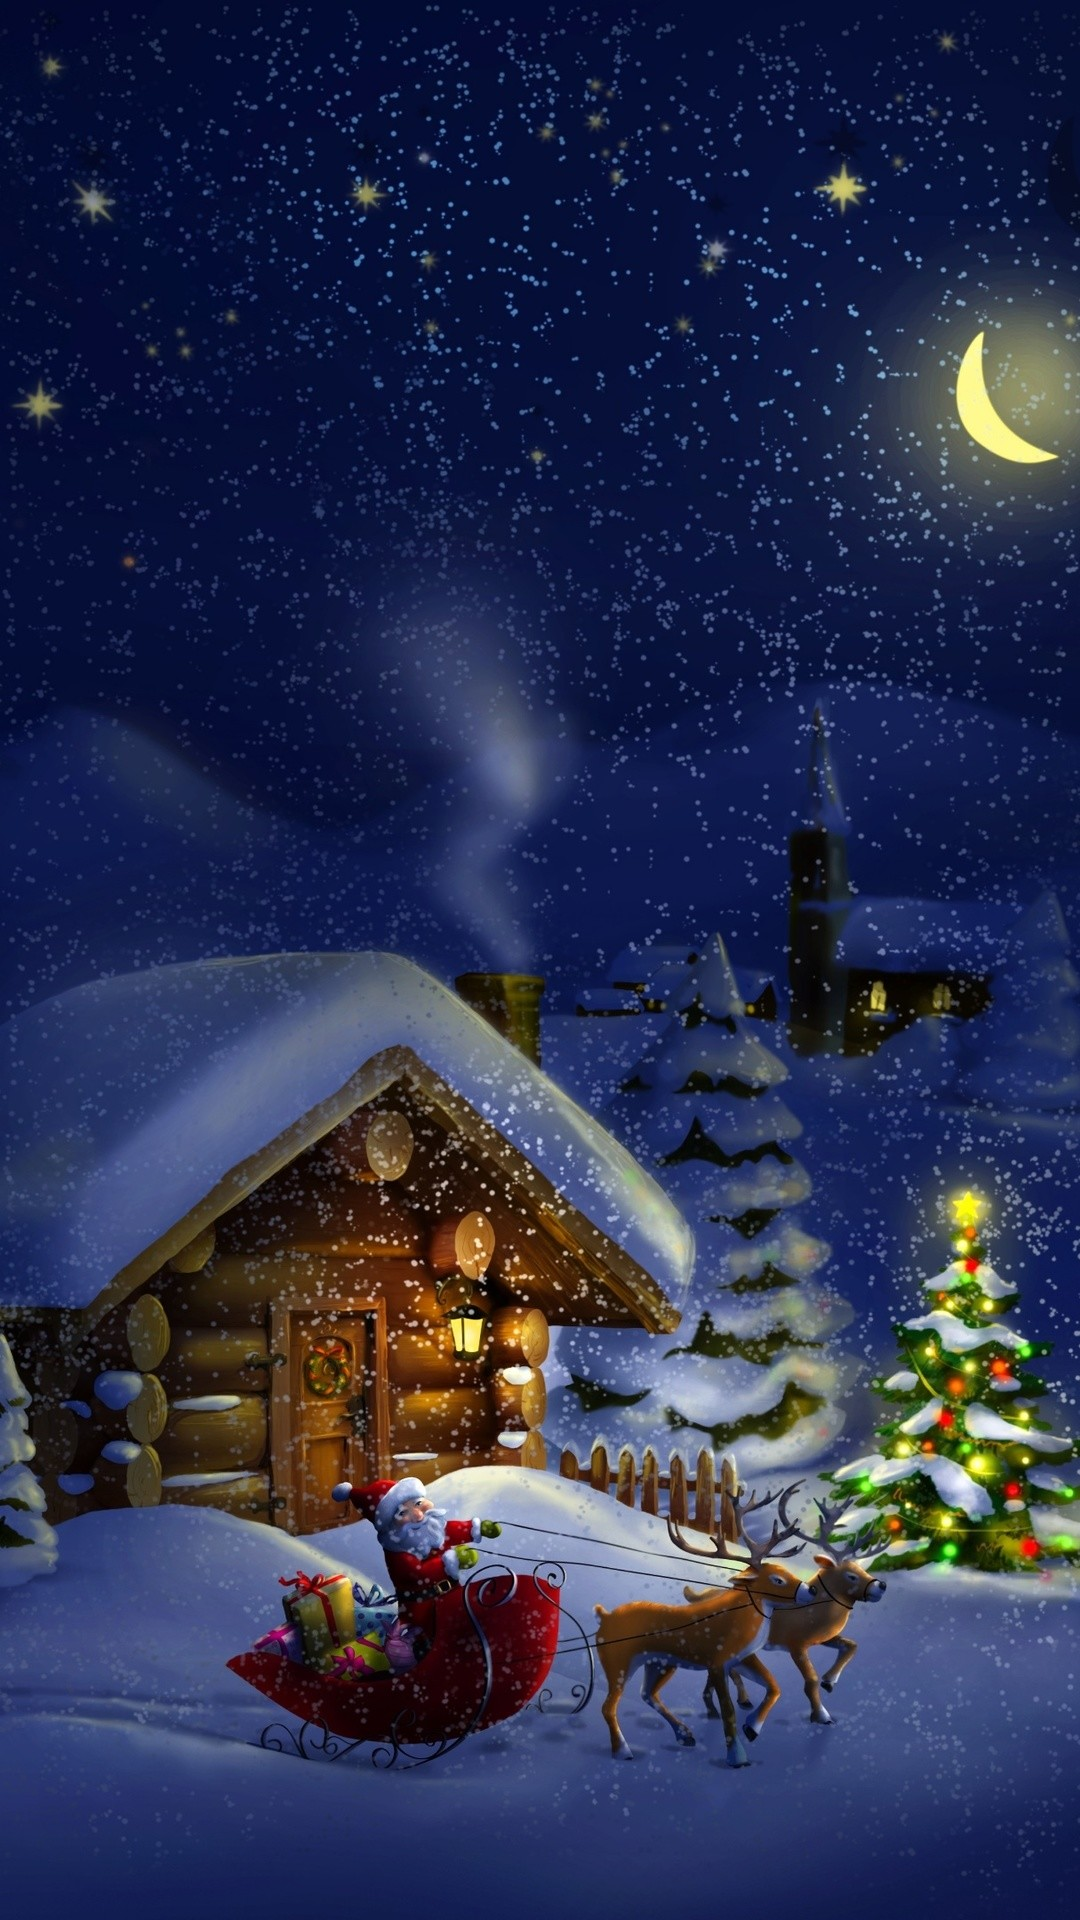 Christmas night with Santa 4K Ultra HD wallpaper | 4k .